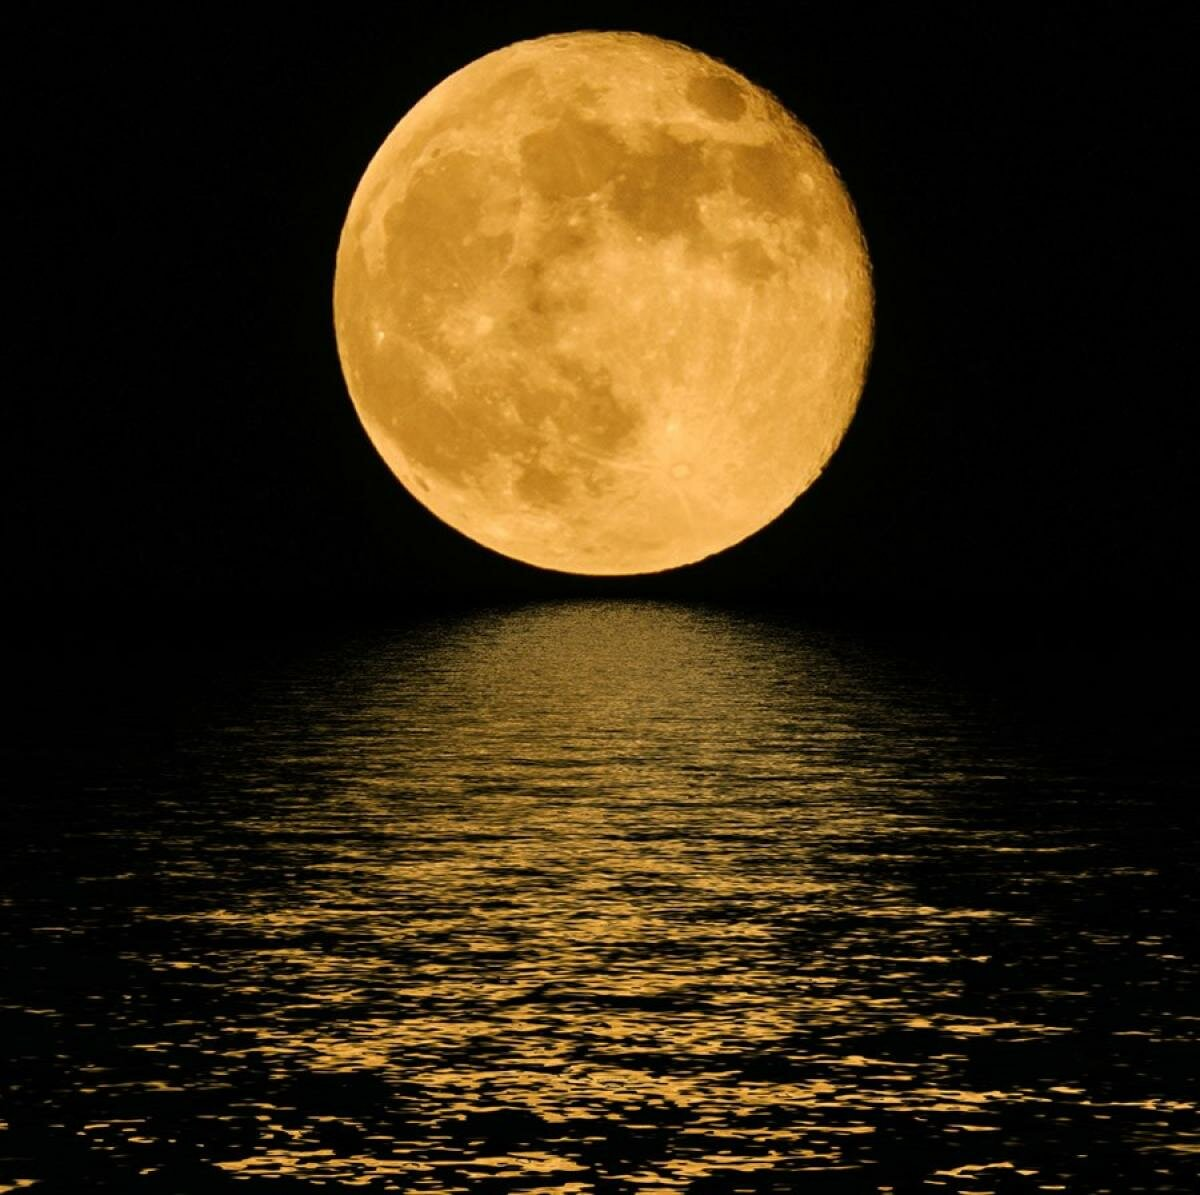 сайт картинок луны всех